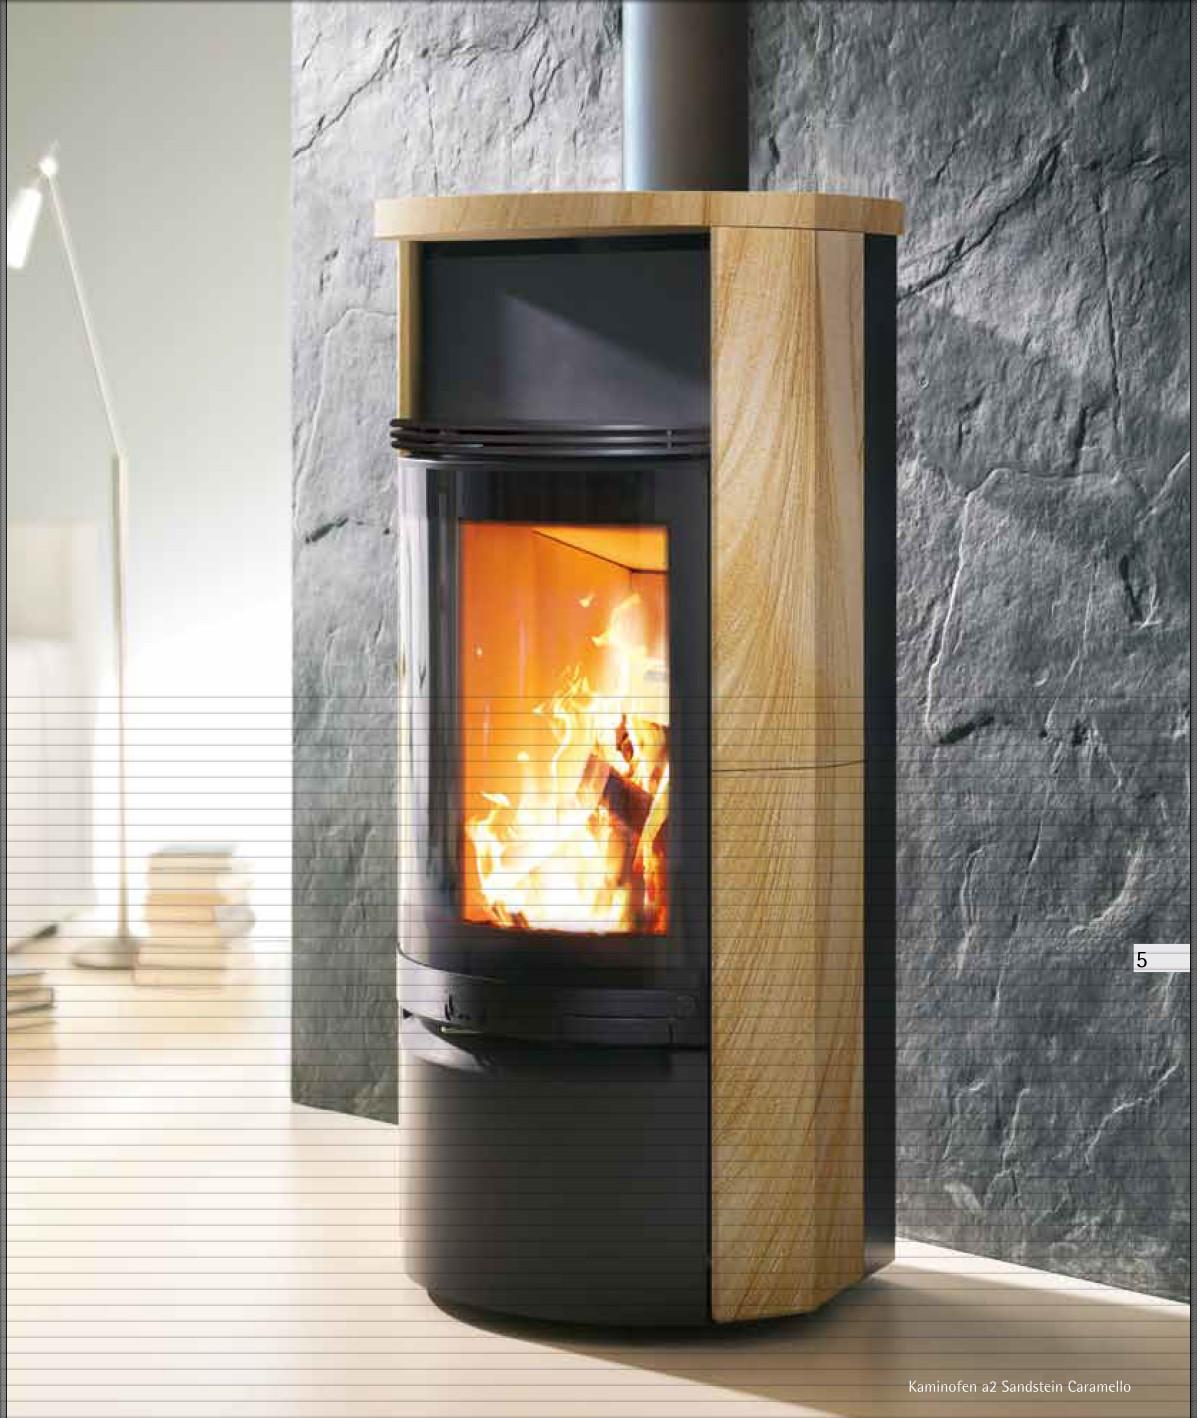 spartherm a2 ambiente kaminofen raumluftunabh ngig. Black Bedroom Furniture Sets. Home Design Ideas